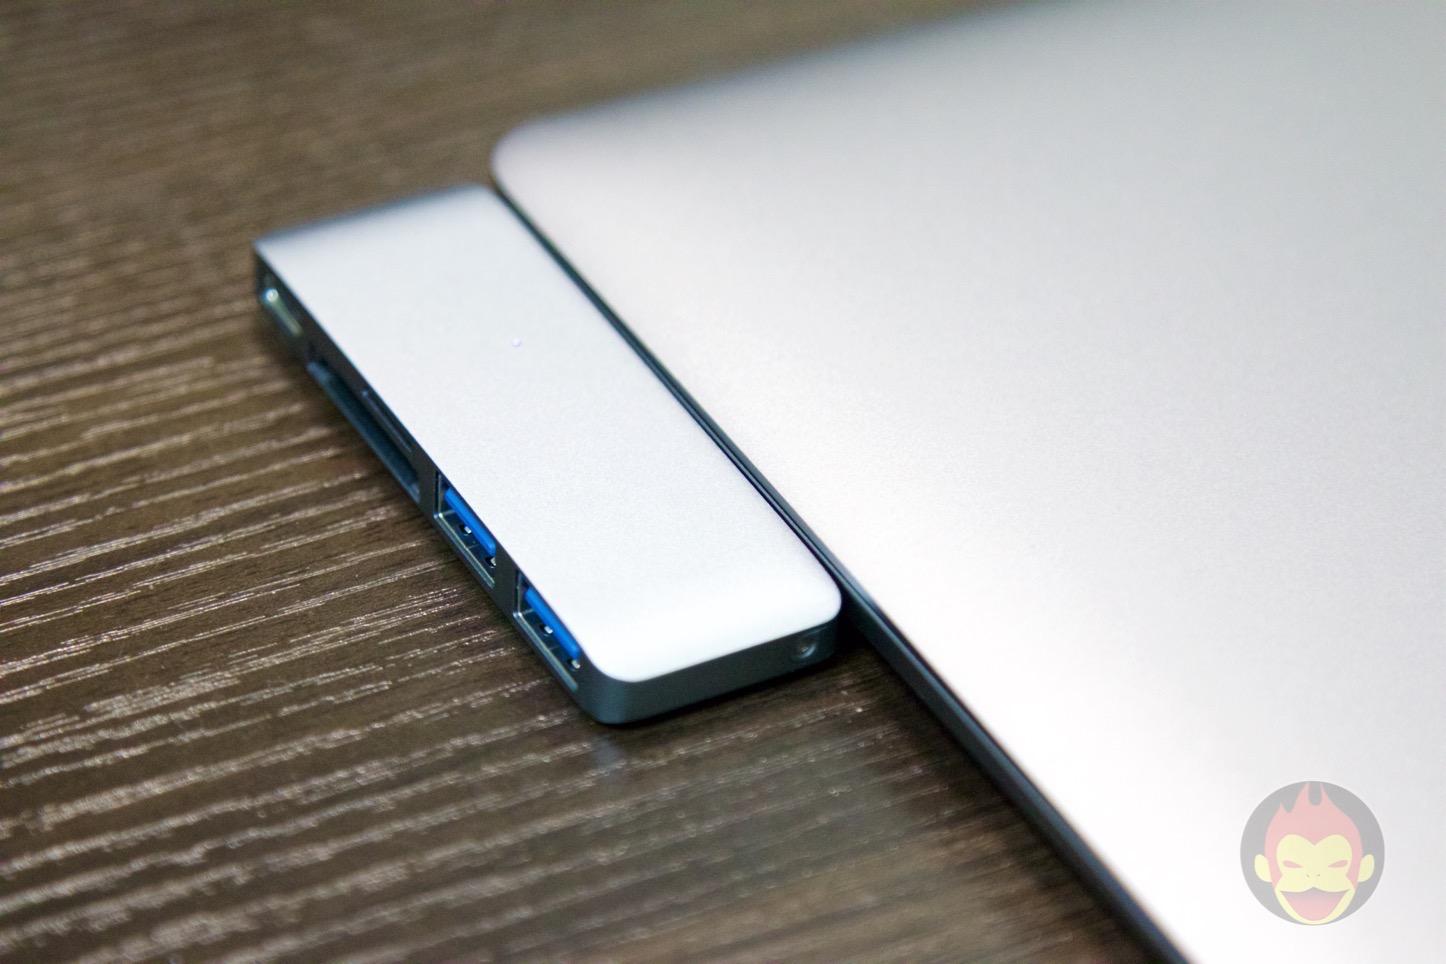 Satechi-MacBook-Type-C-3in1-06.jpg